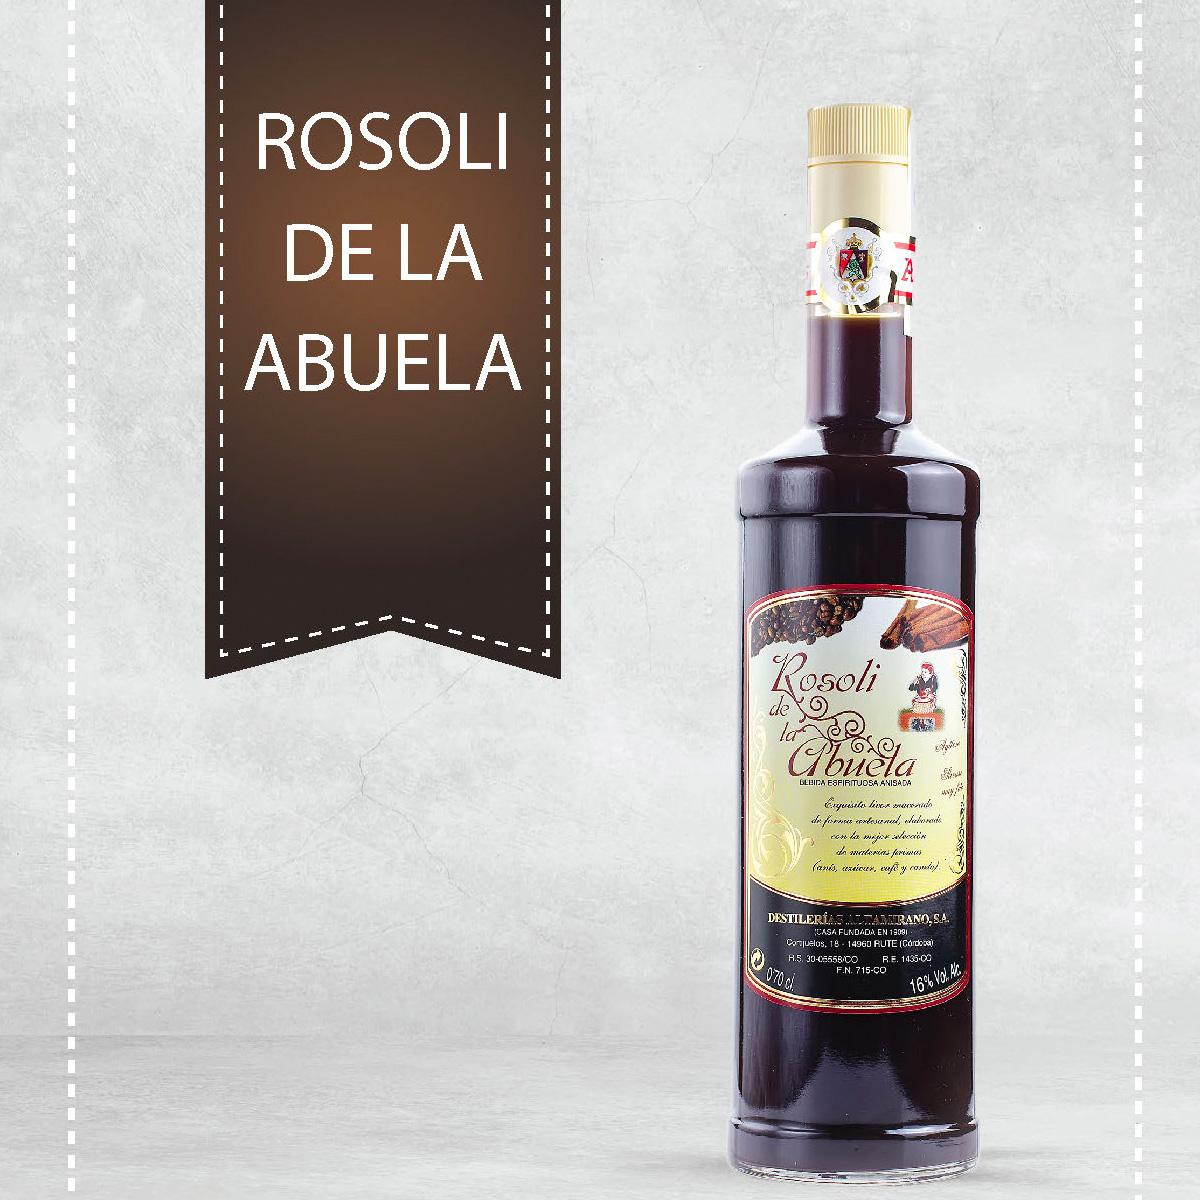 Altamirano – ROSOLI